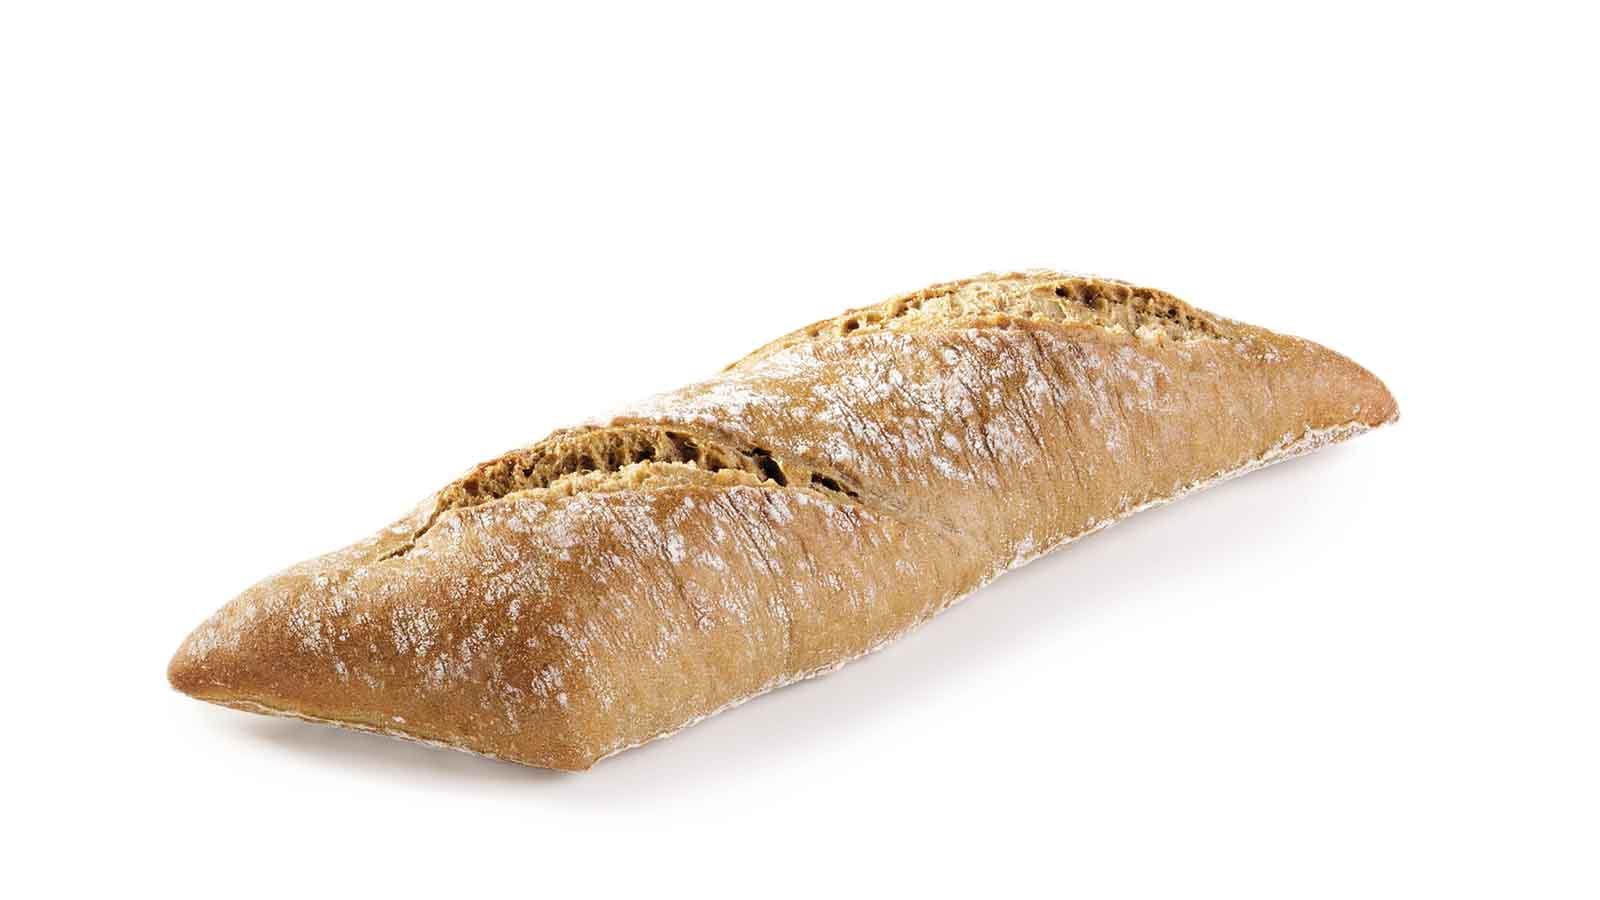 Rustic mini baguette